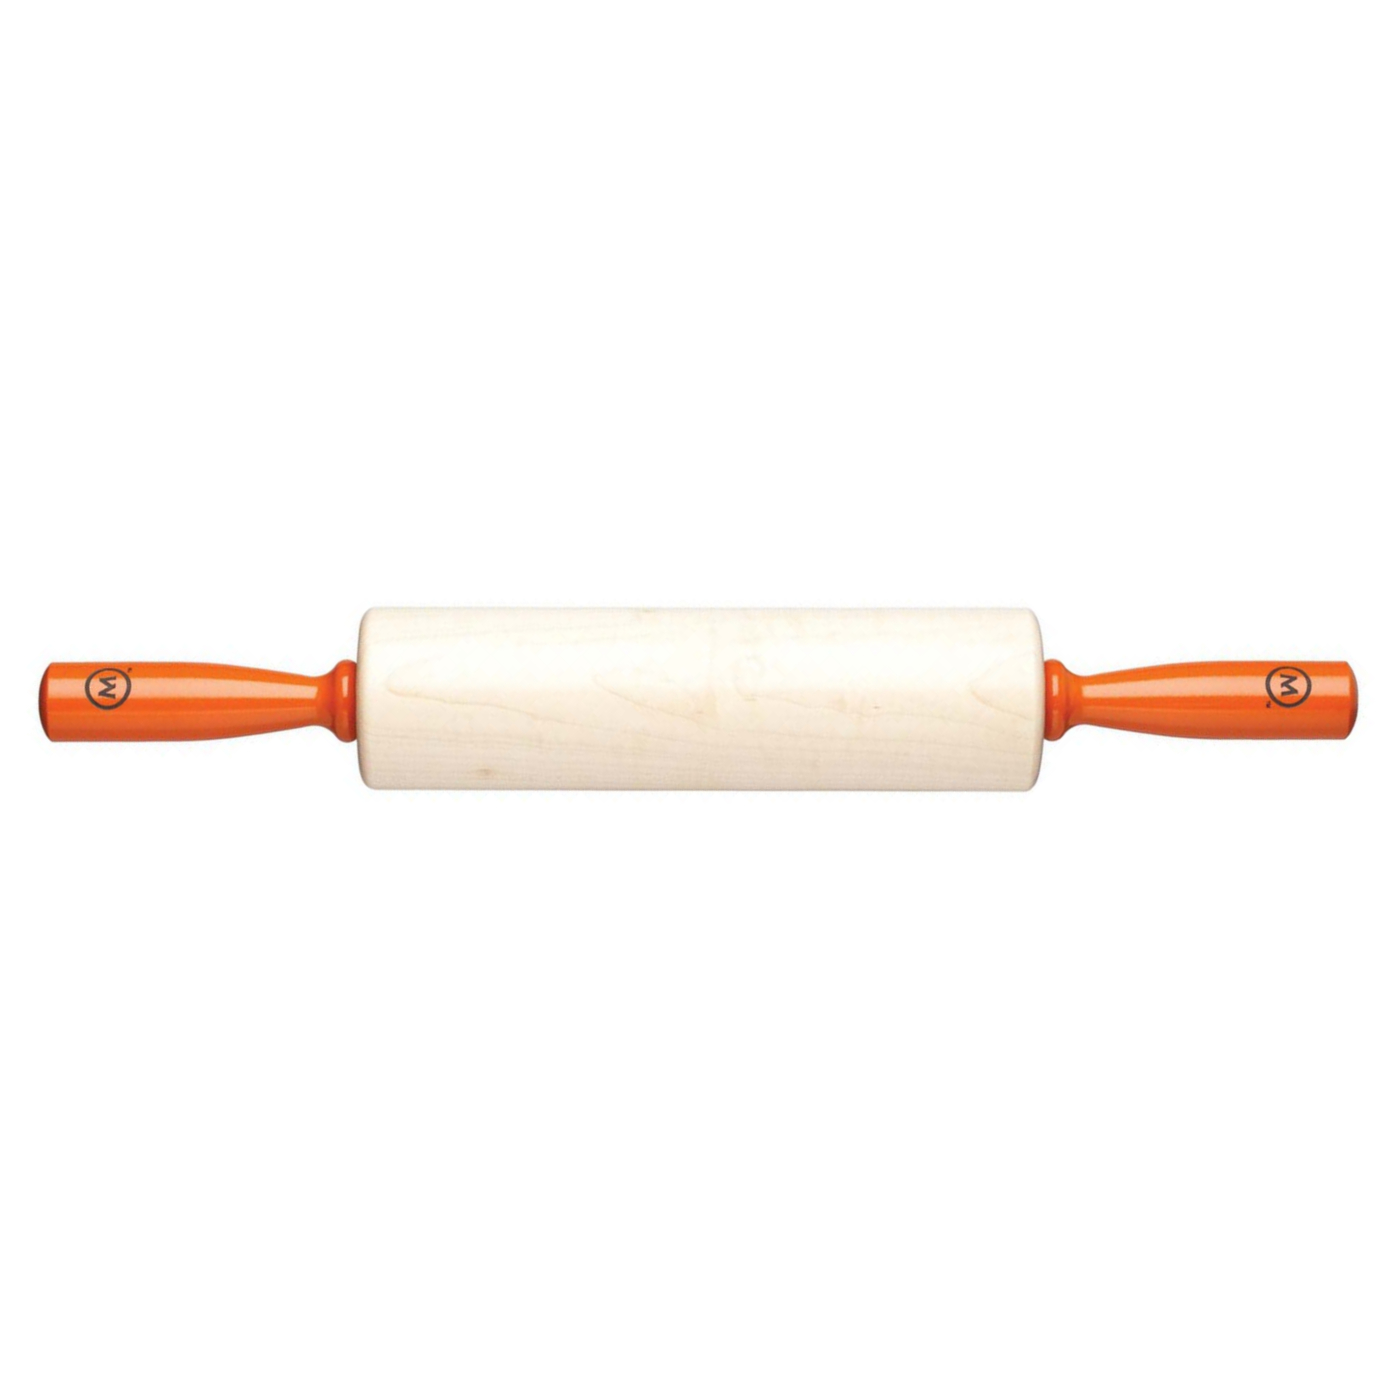 Fletcher's Mill Mario Batali Maple 10 Inch Rolling Pin with Orange Handles